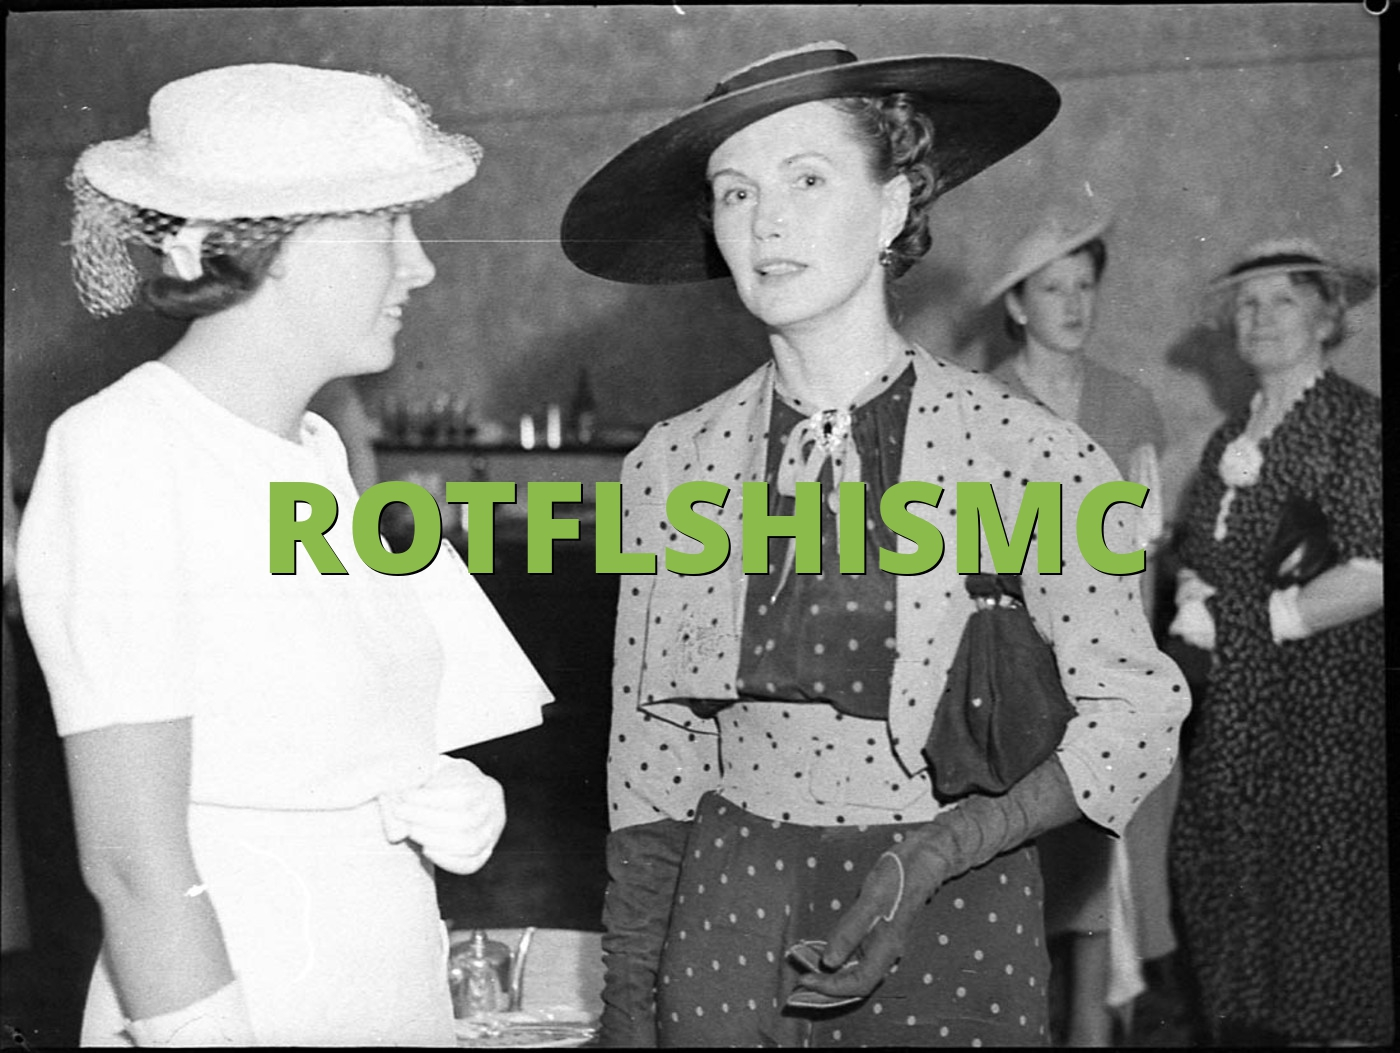 ROTFLSHISMC